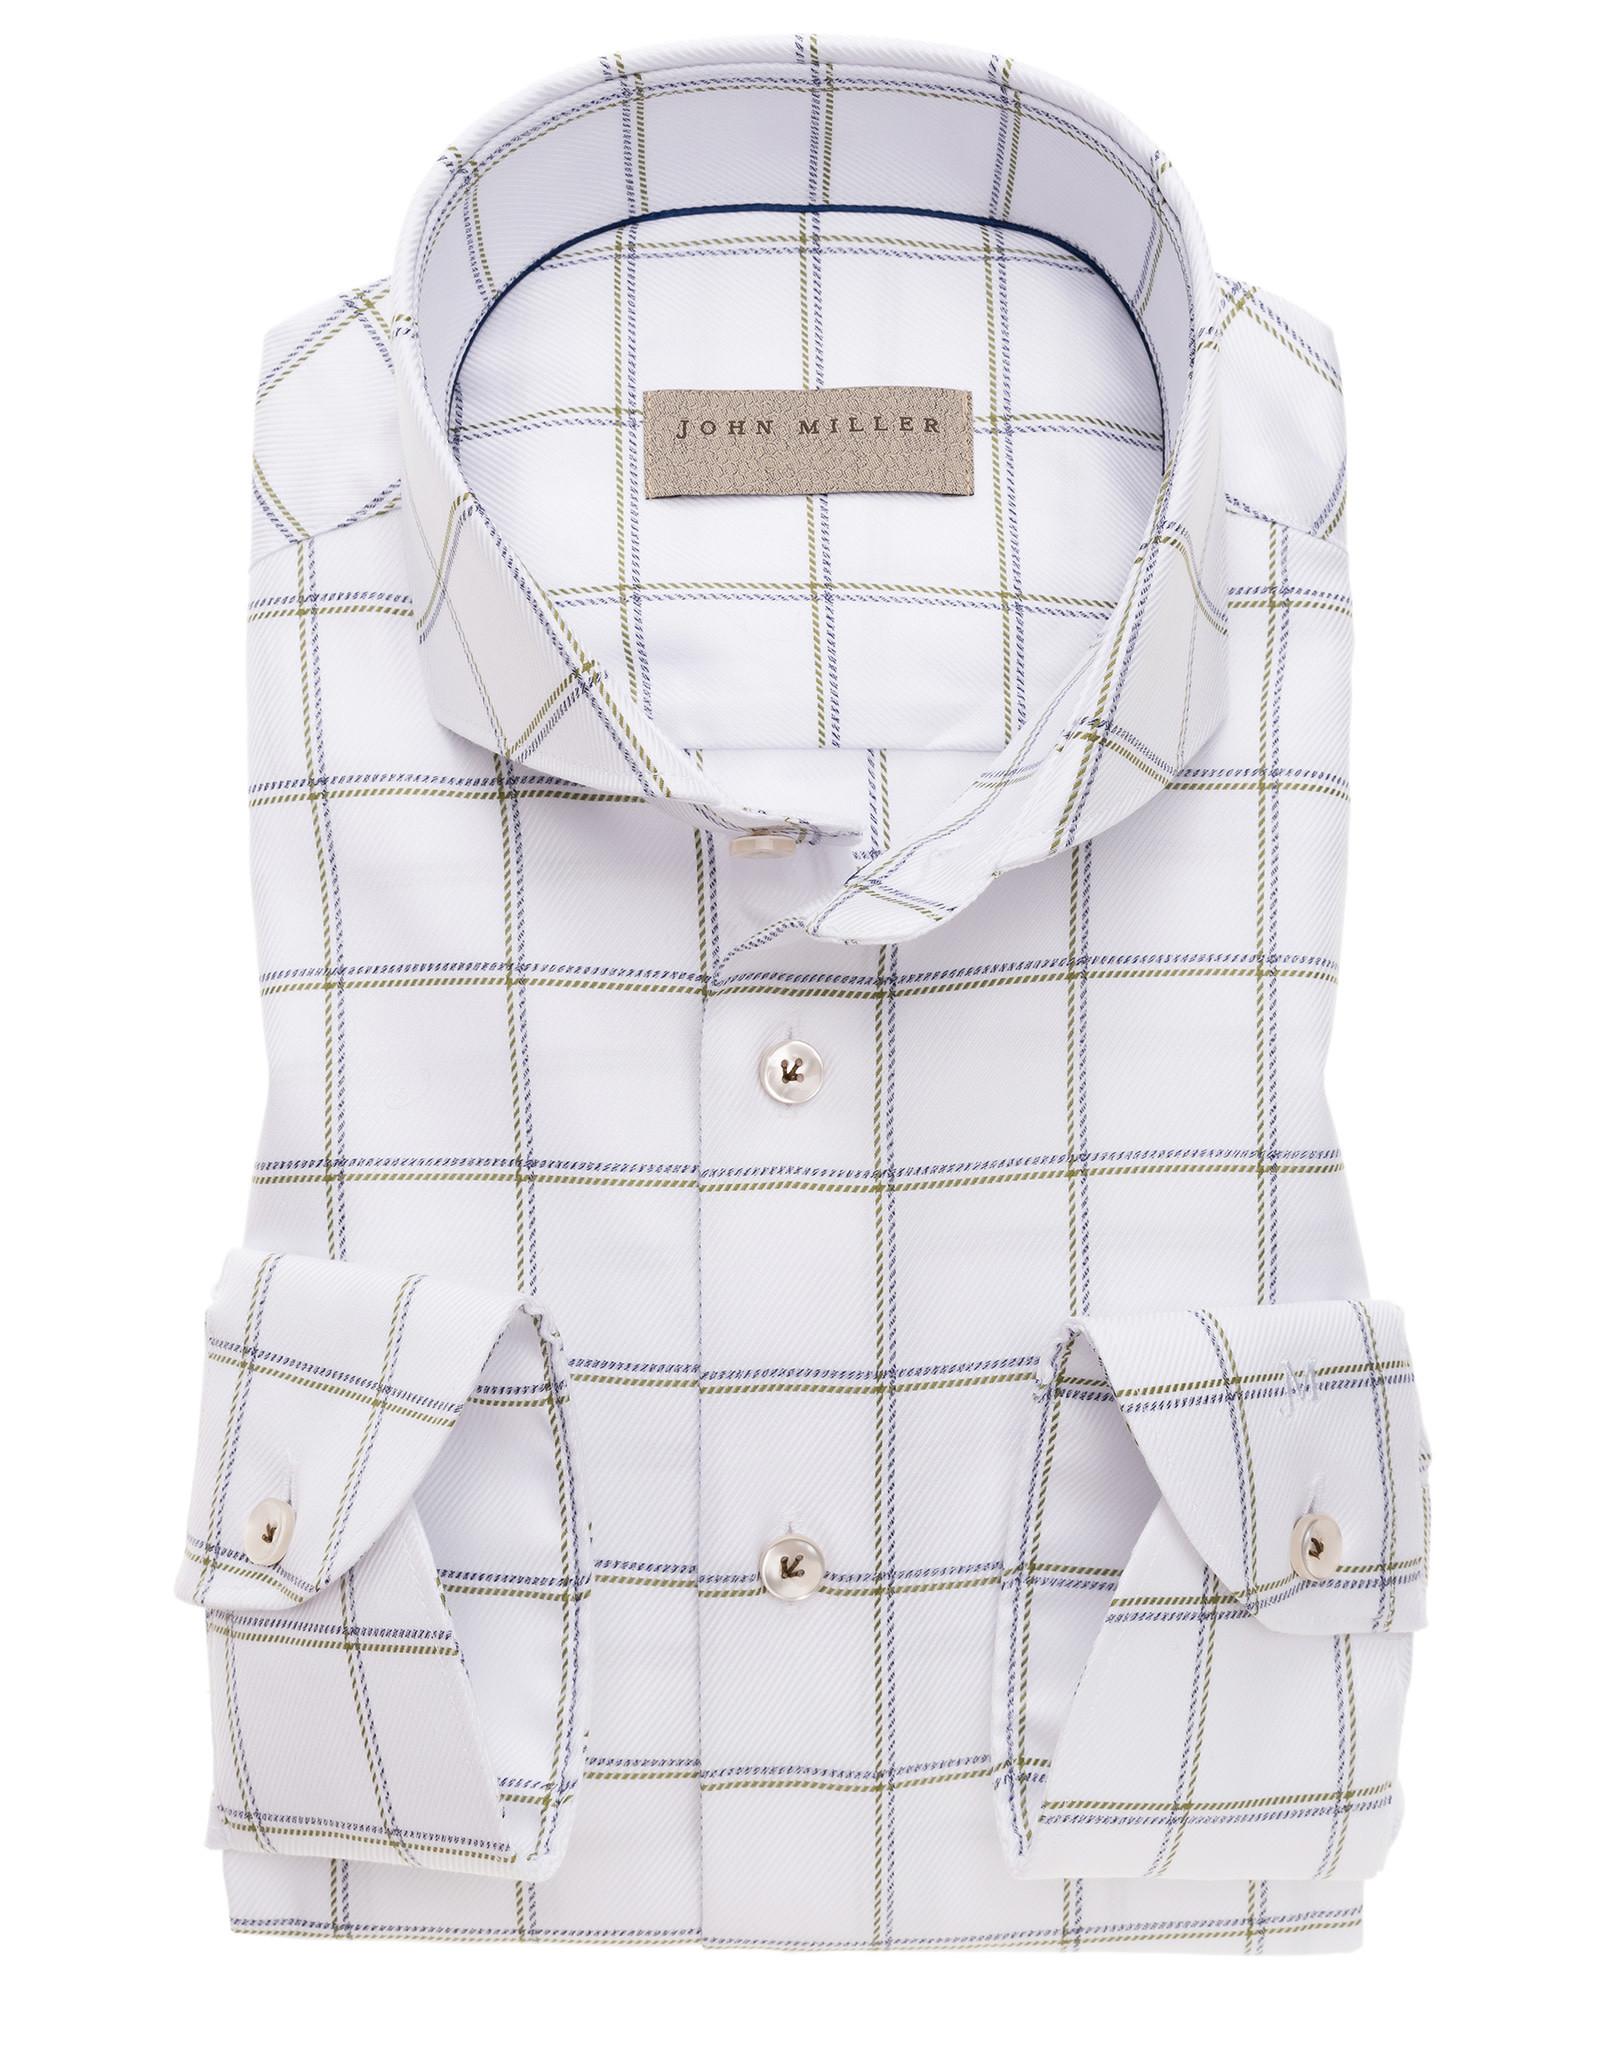 John Miller tailored fit shirt wit combi met cut away boord